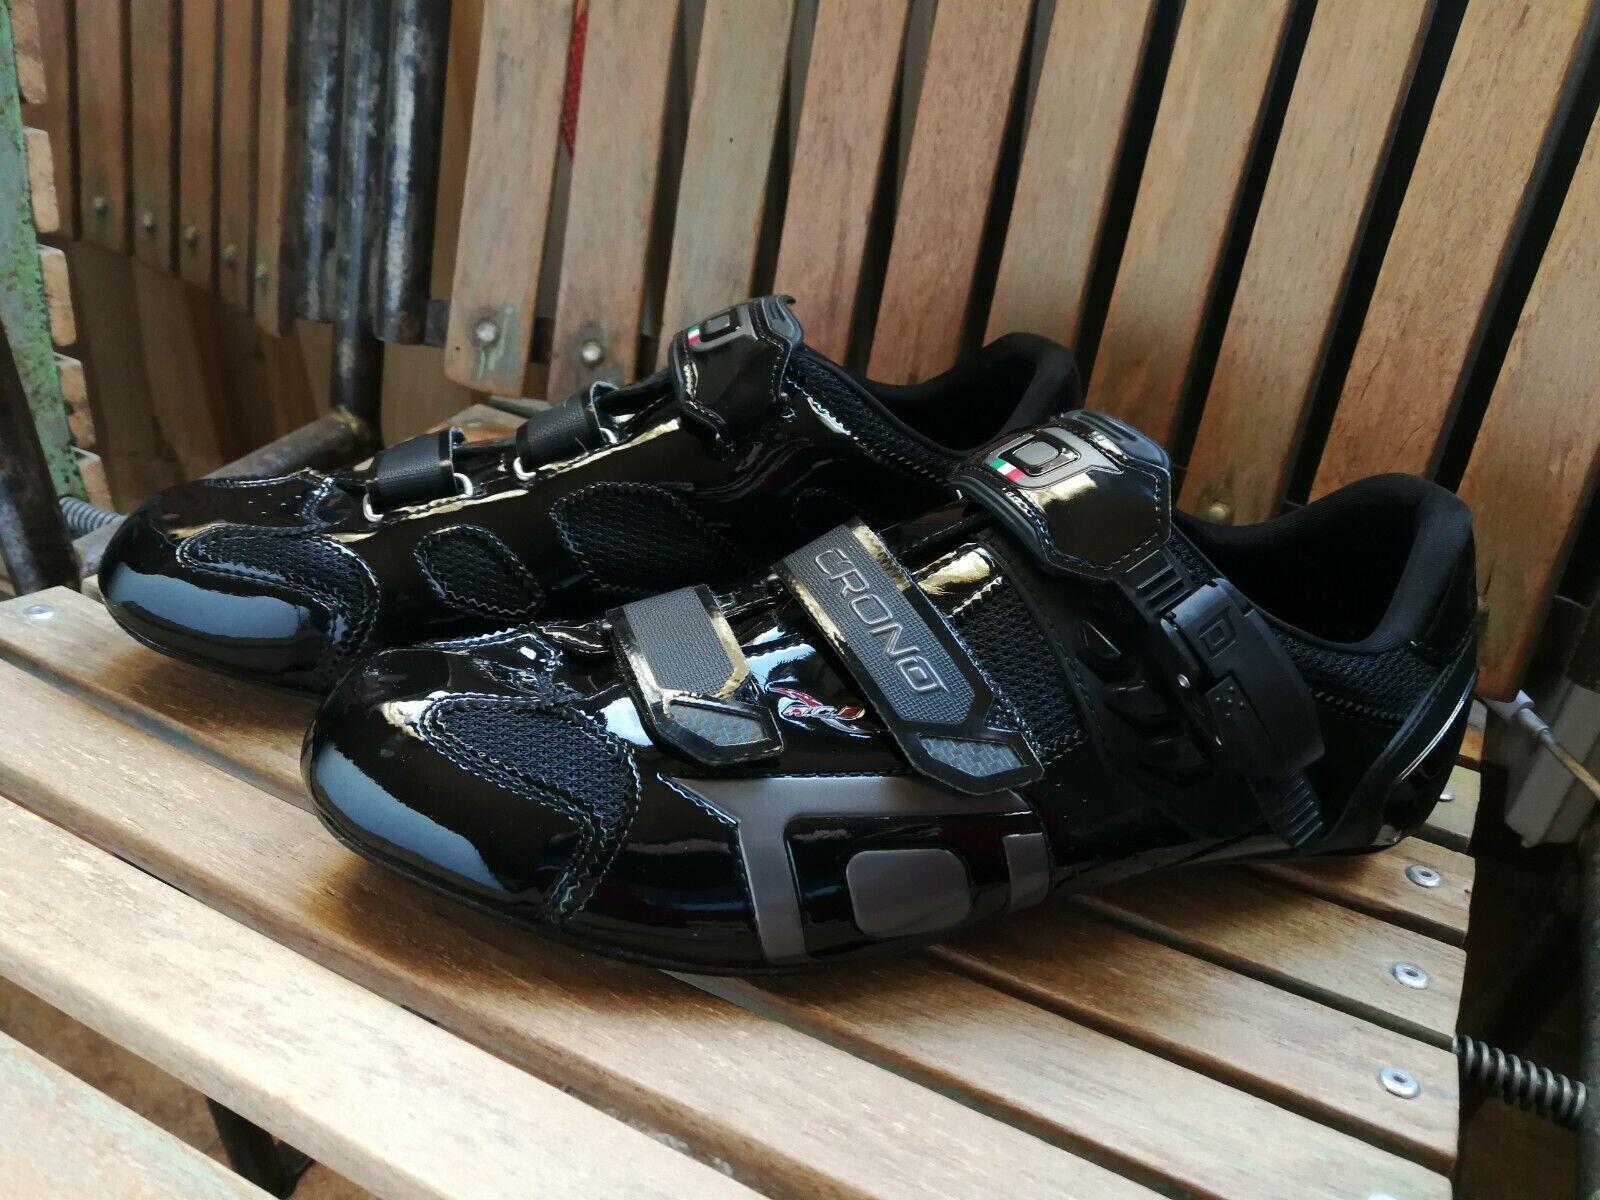 shoes Bici Ciclismo CRONO CLONE carbon